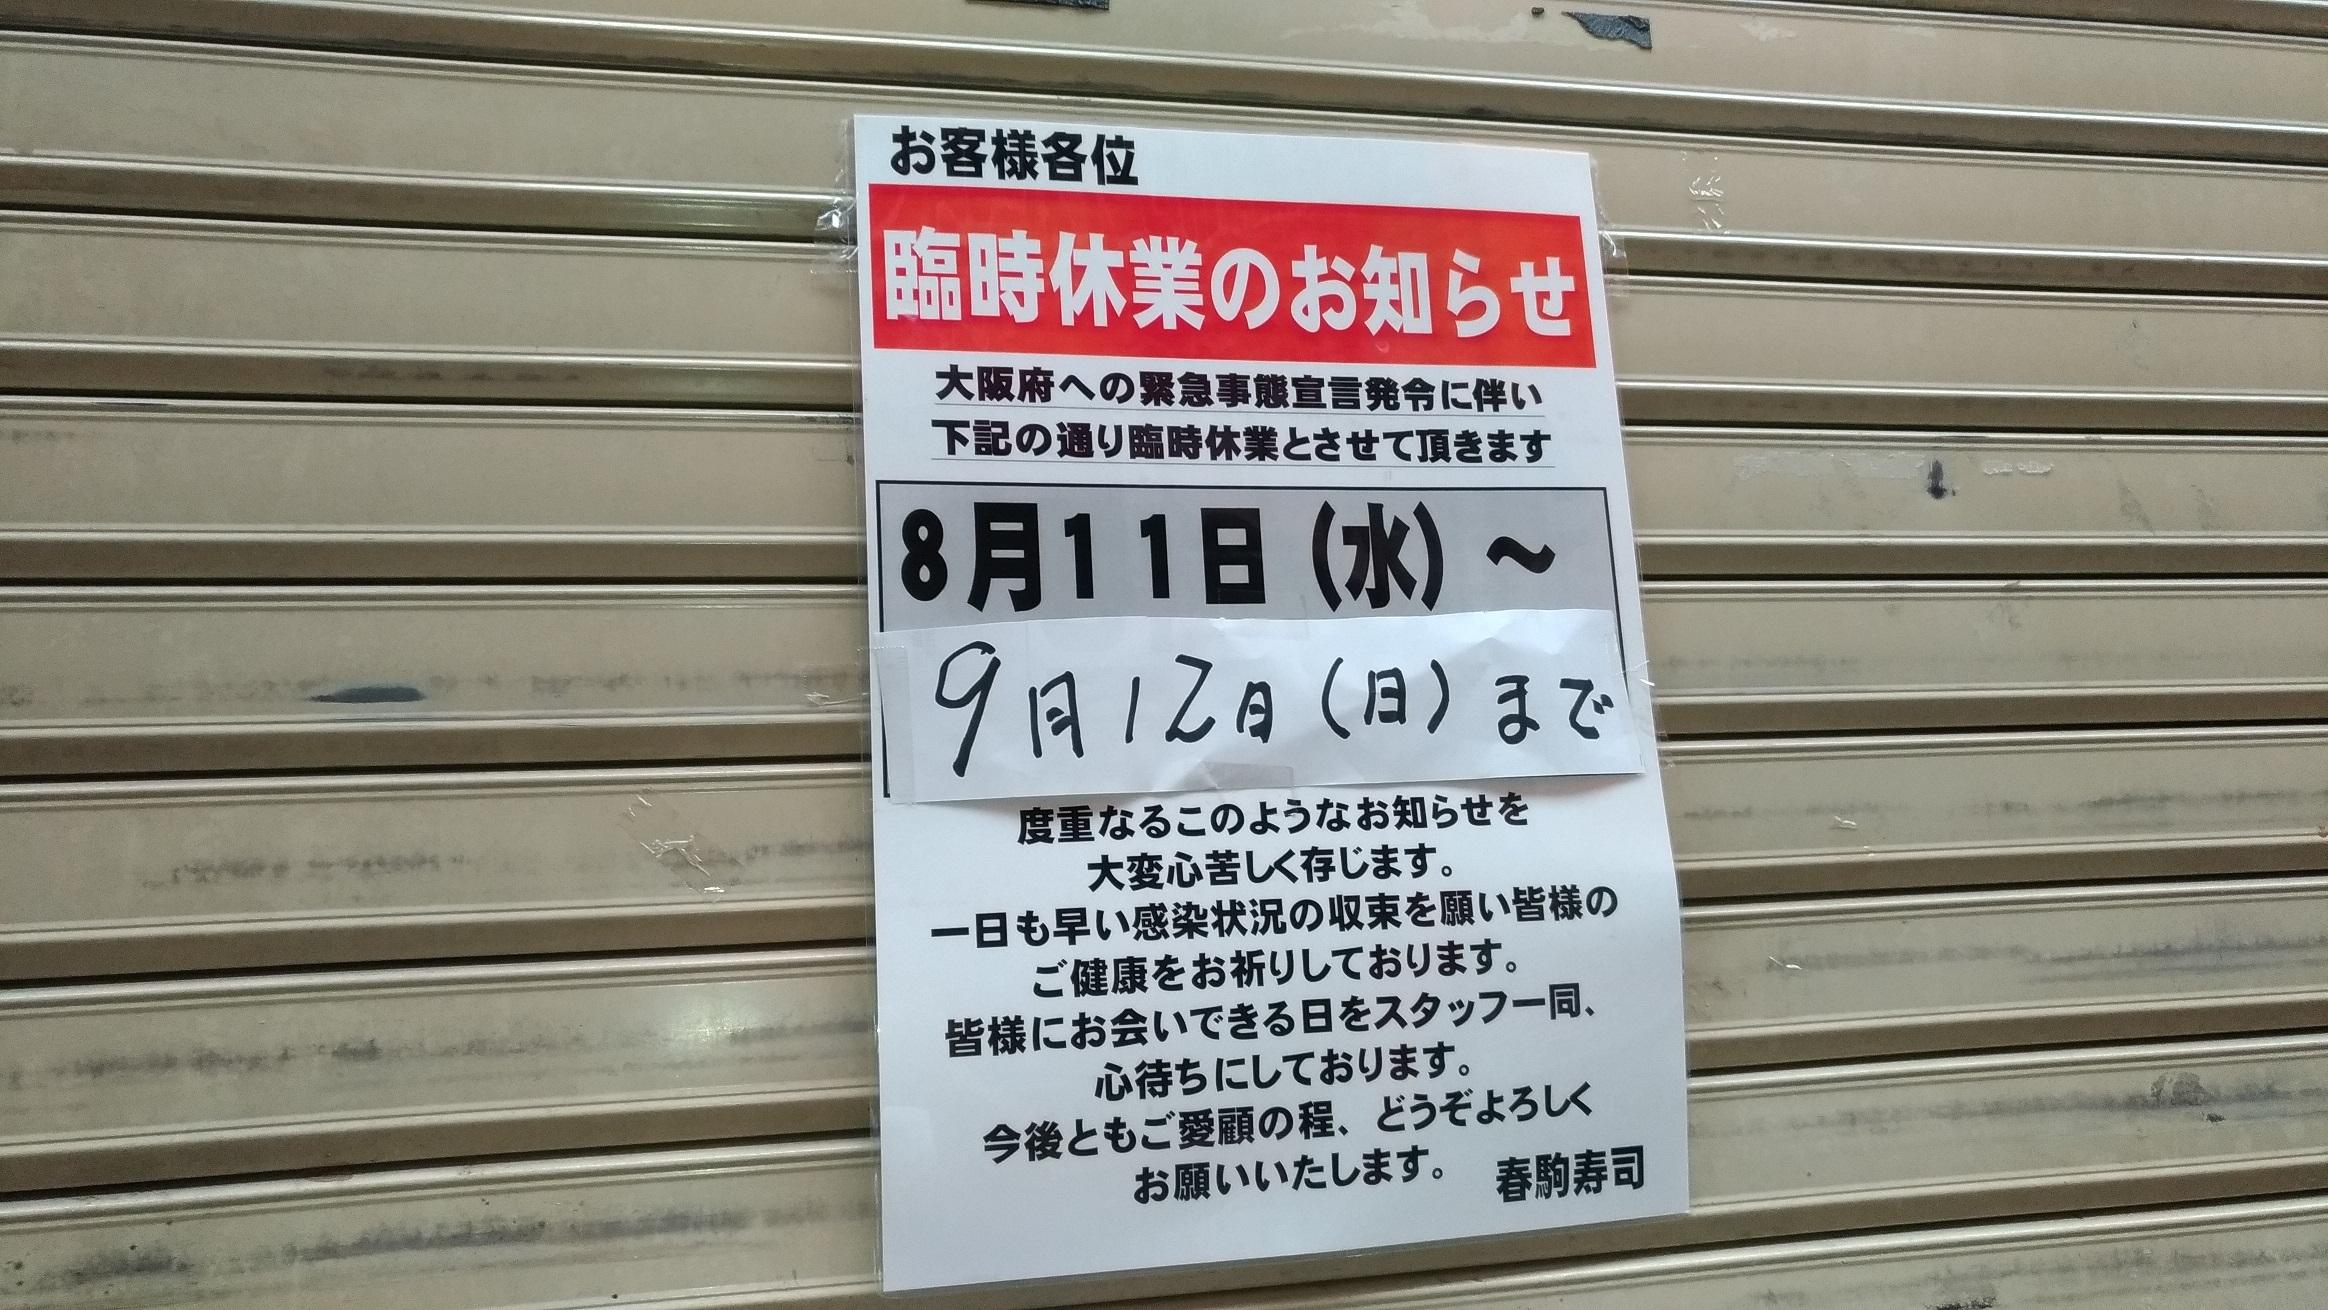 0osaka_sushi_12.jpg